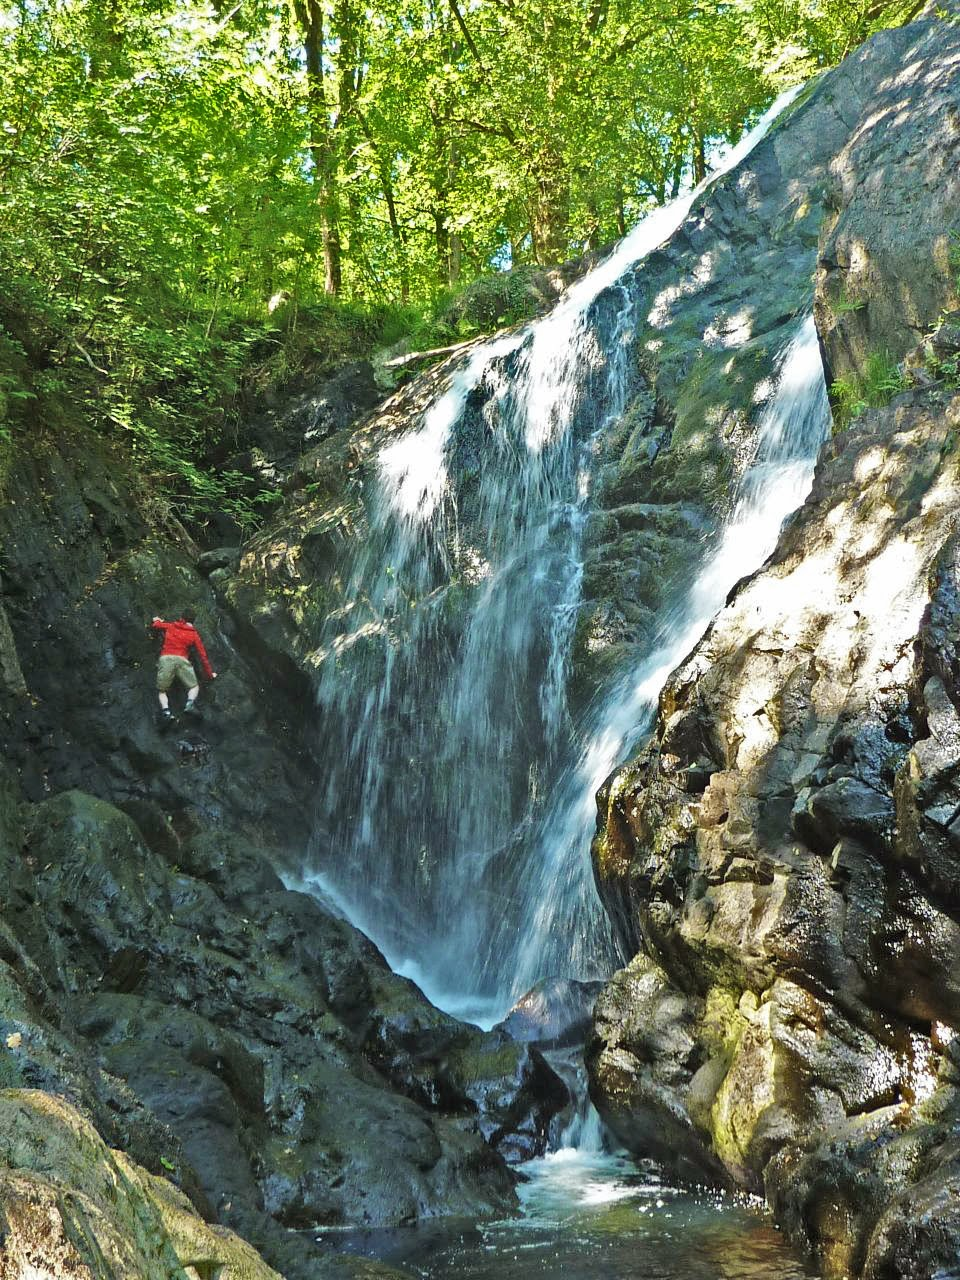 Gorge Scrambling in North